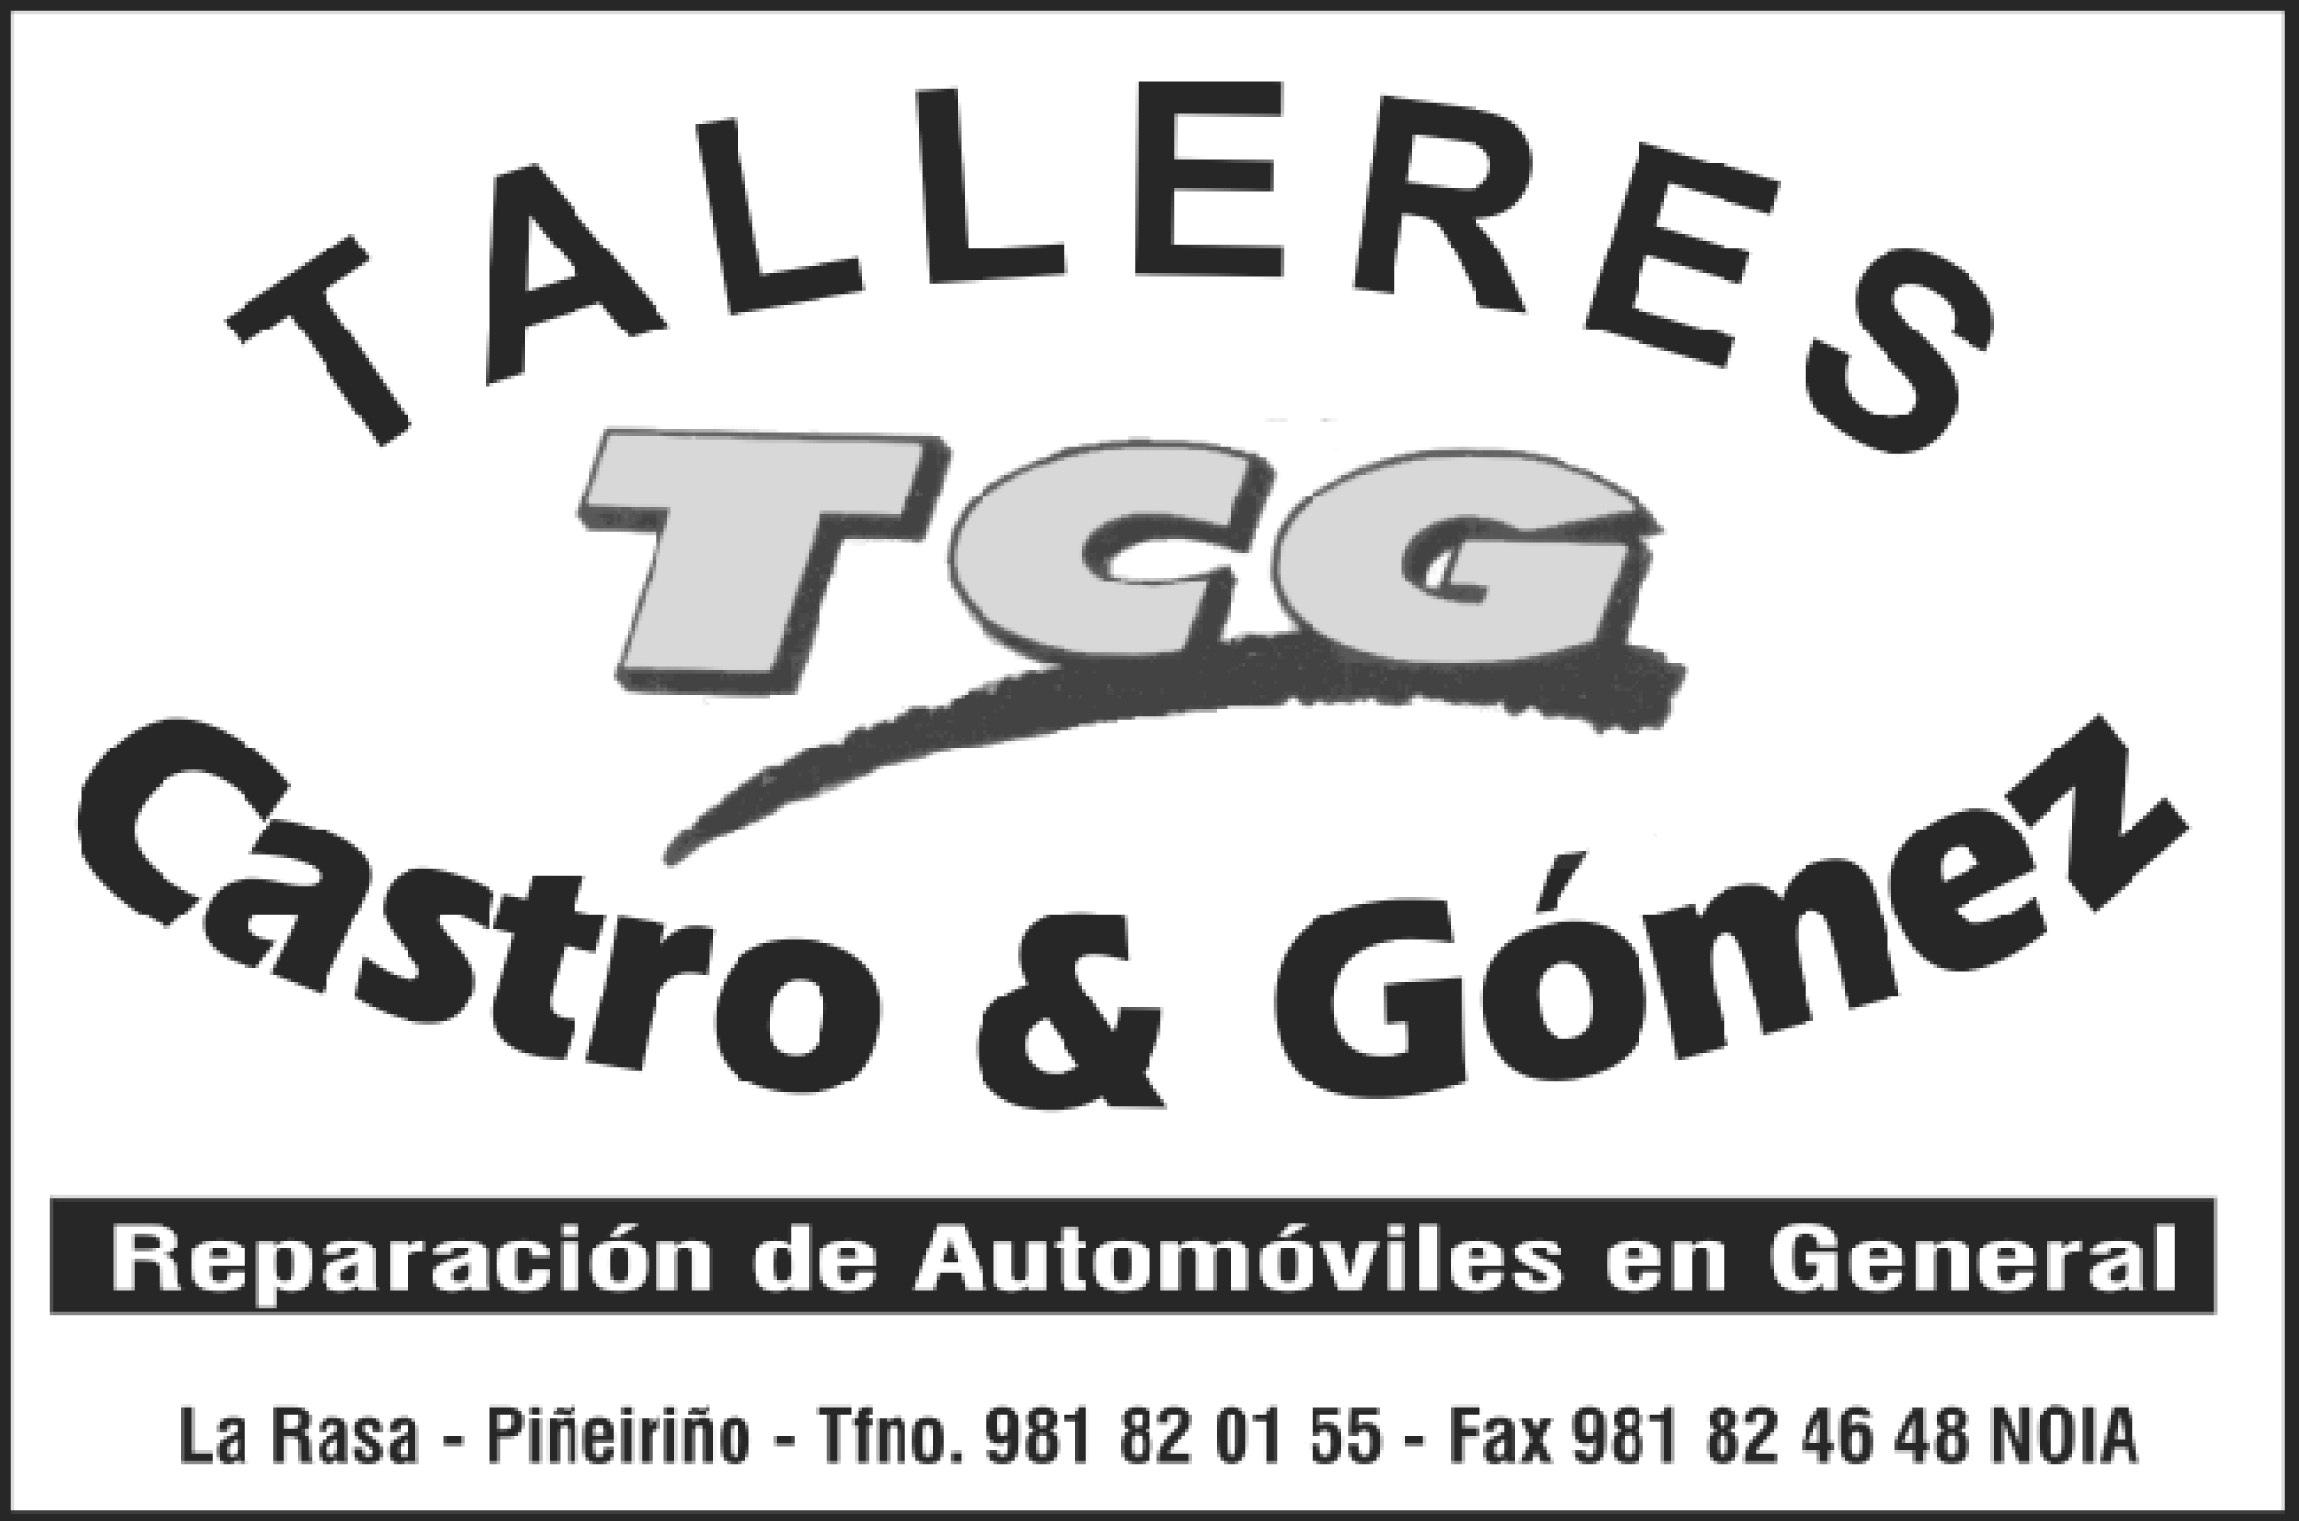 talleres-tcg.jpg